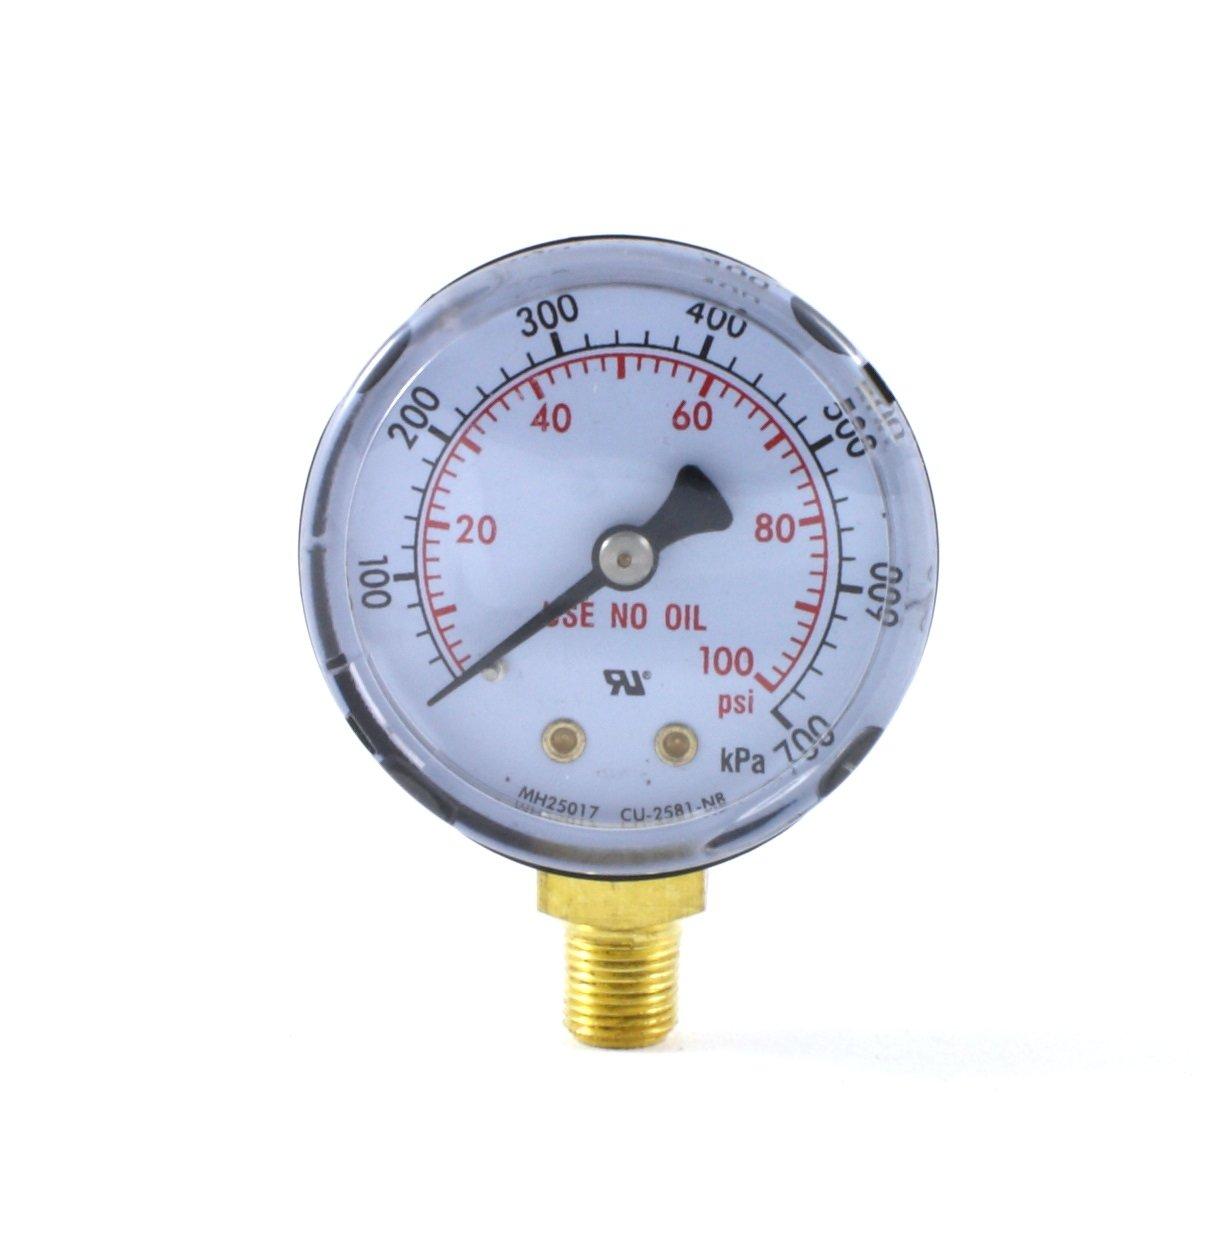 High Pressure Gauge for Oxygen Regulator 0-4000 psi - 2 inches for LDB Regulators SÜA